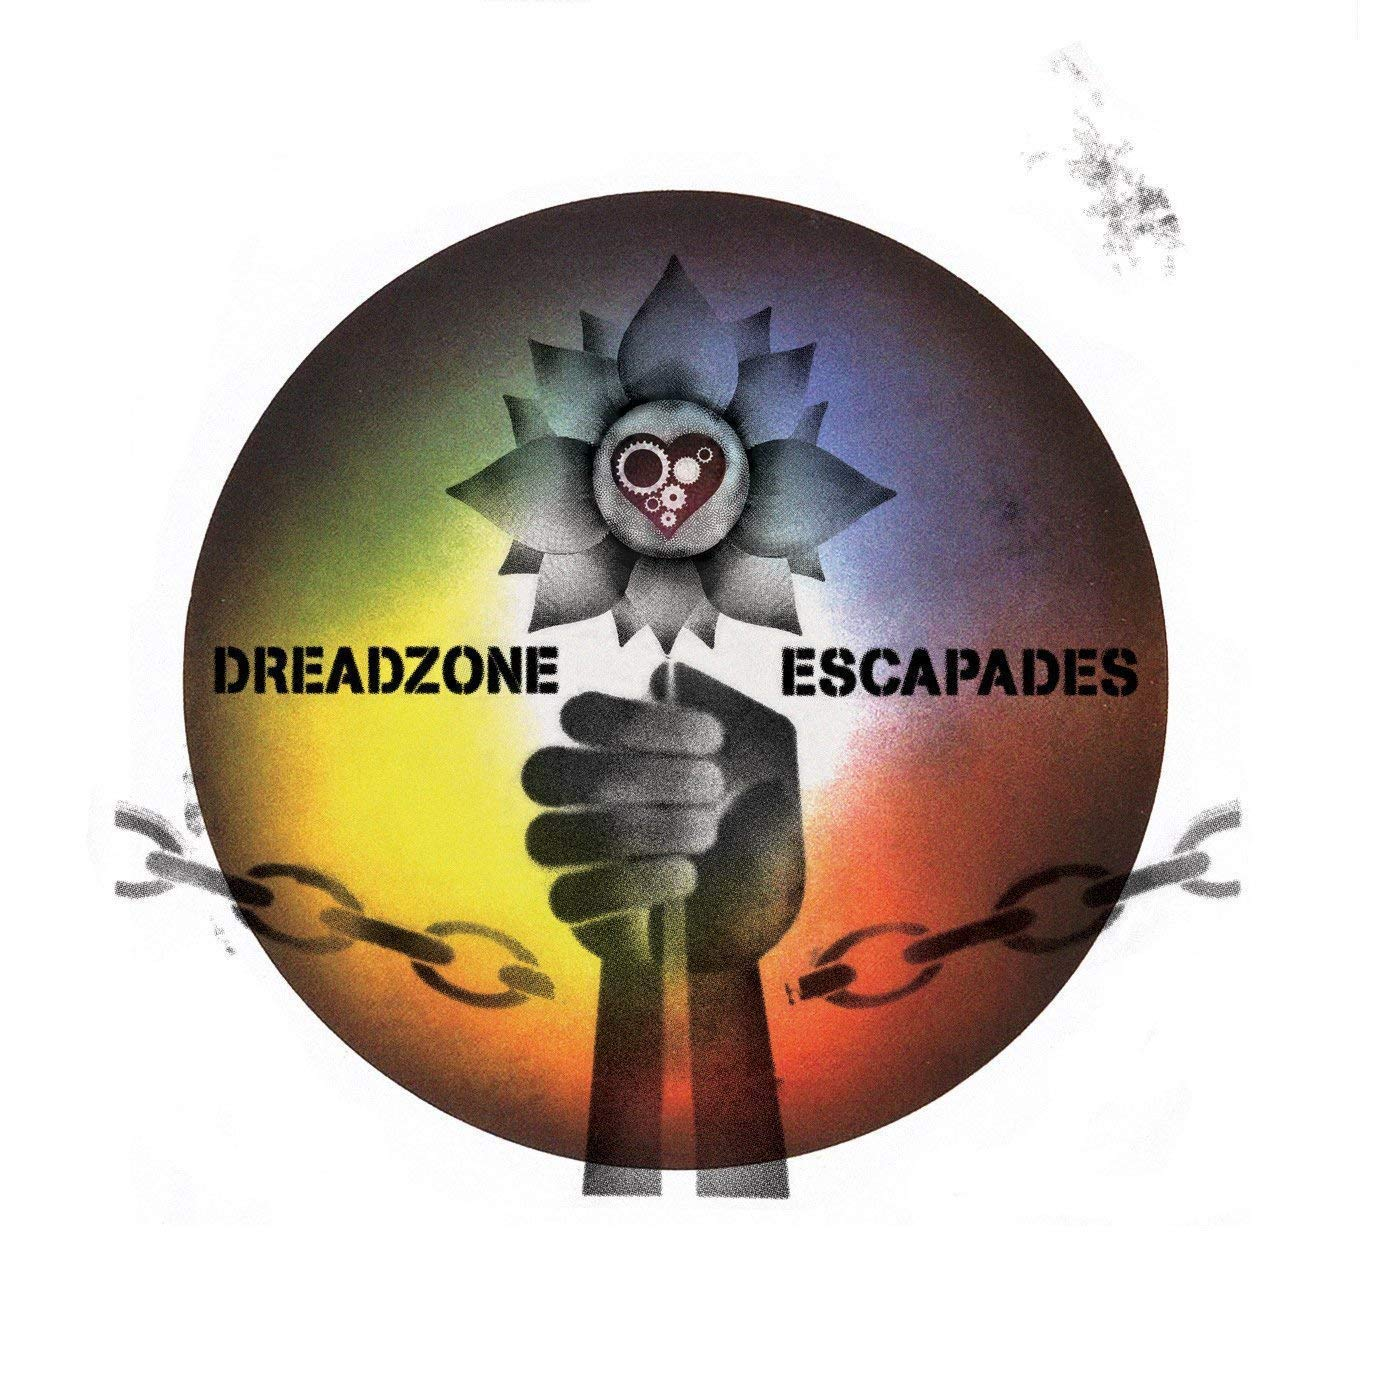 Dreadzone - Escapades